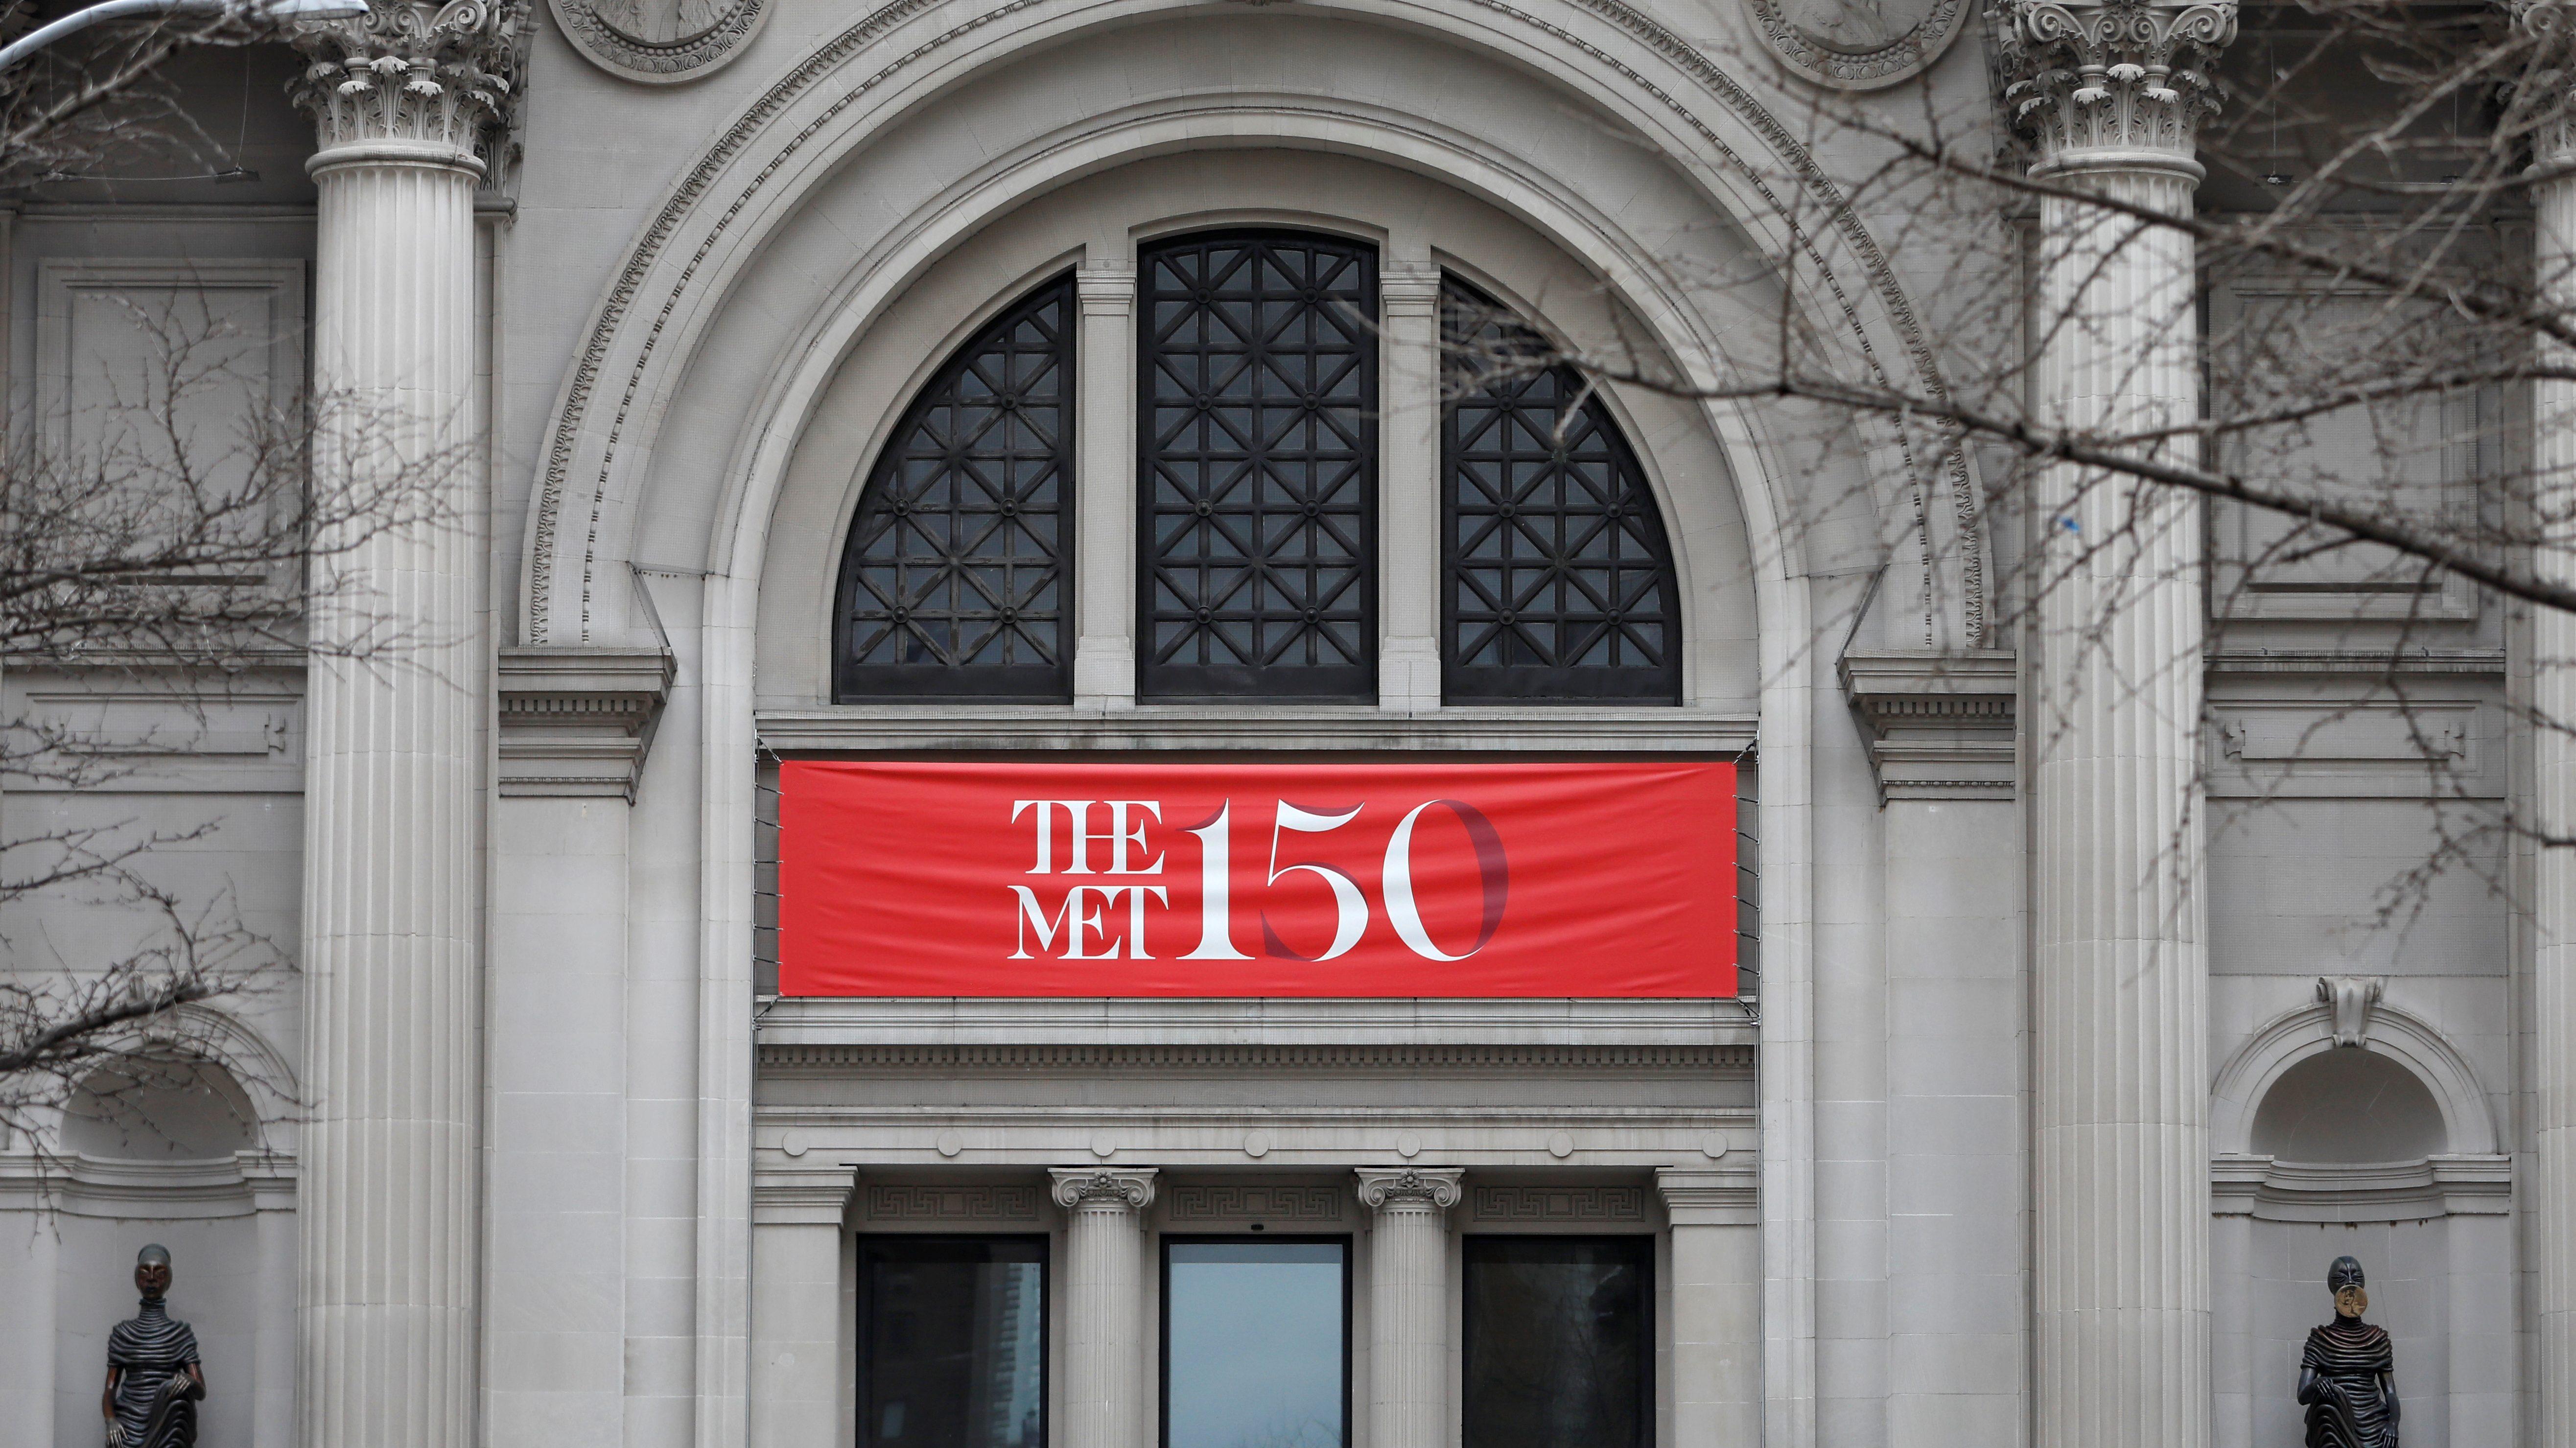 Lead image: Met Museum facade